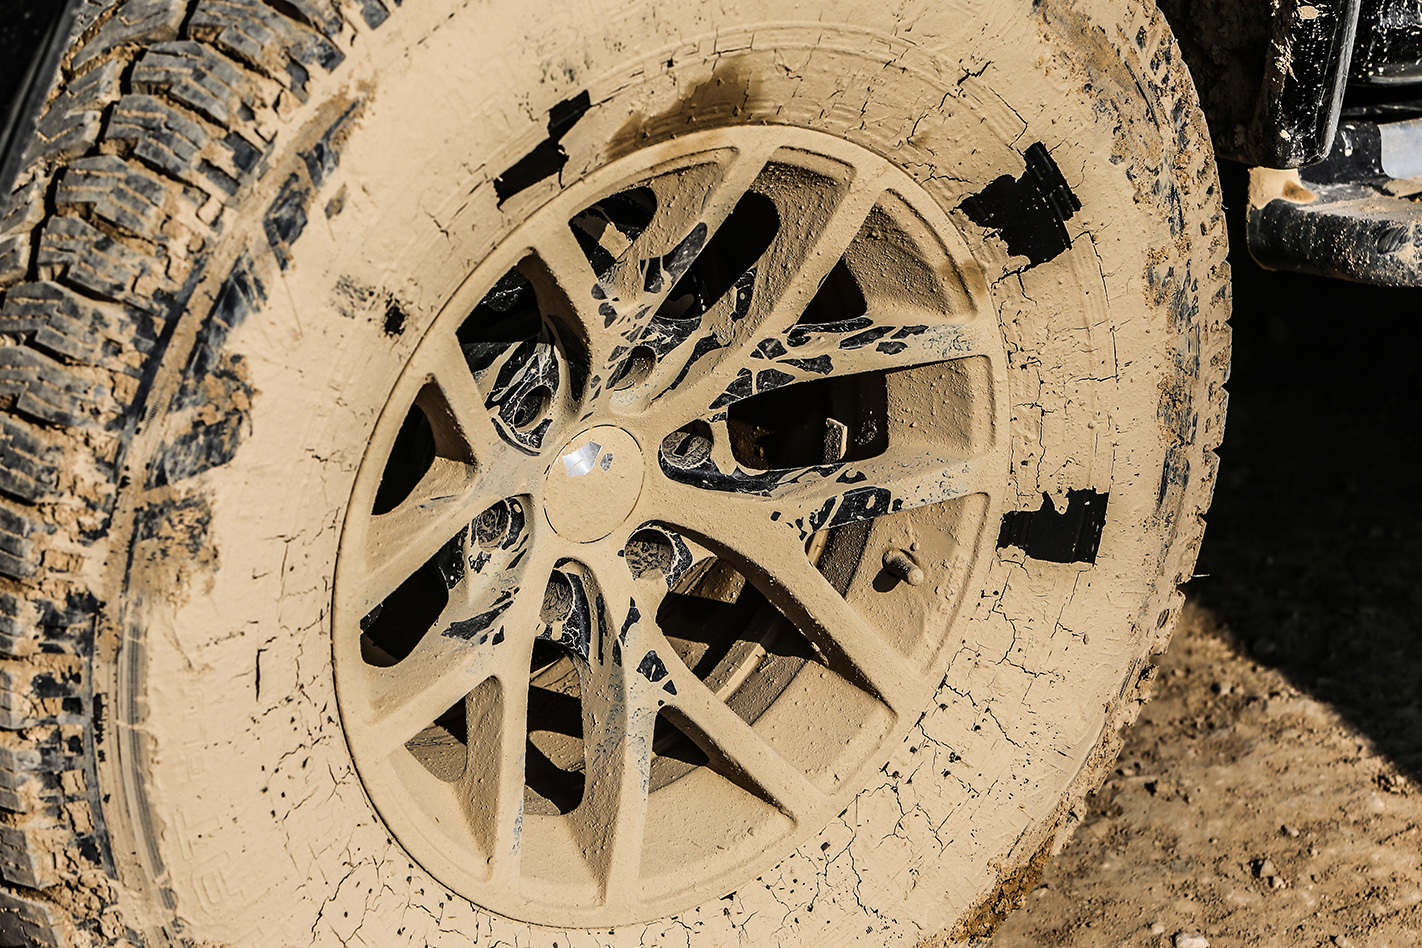 2016 Isuzu D-MAX AT35 tyre